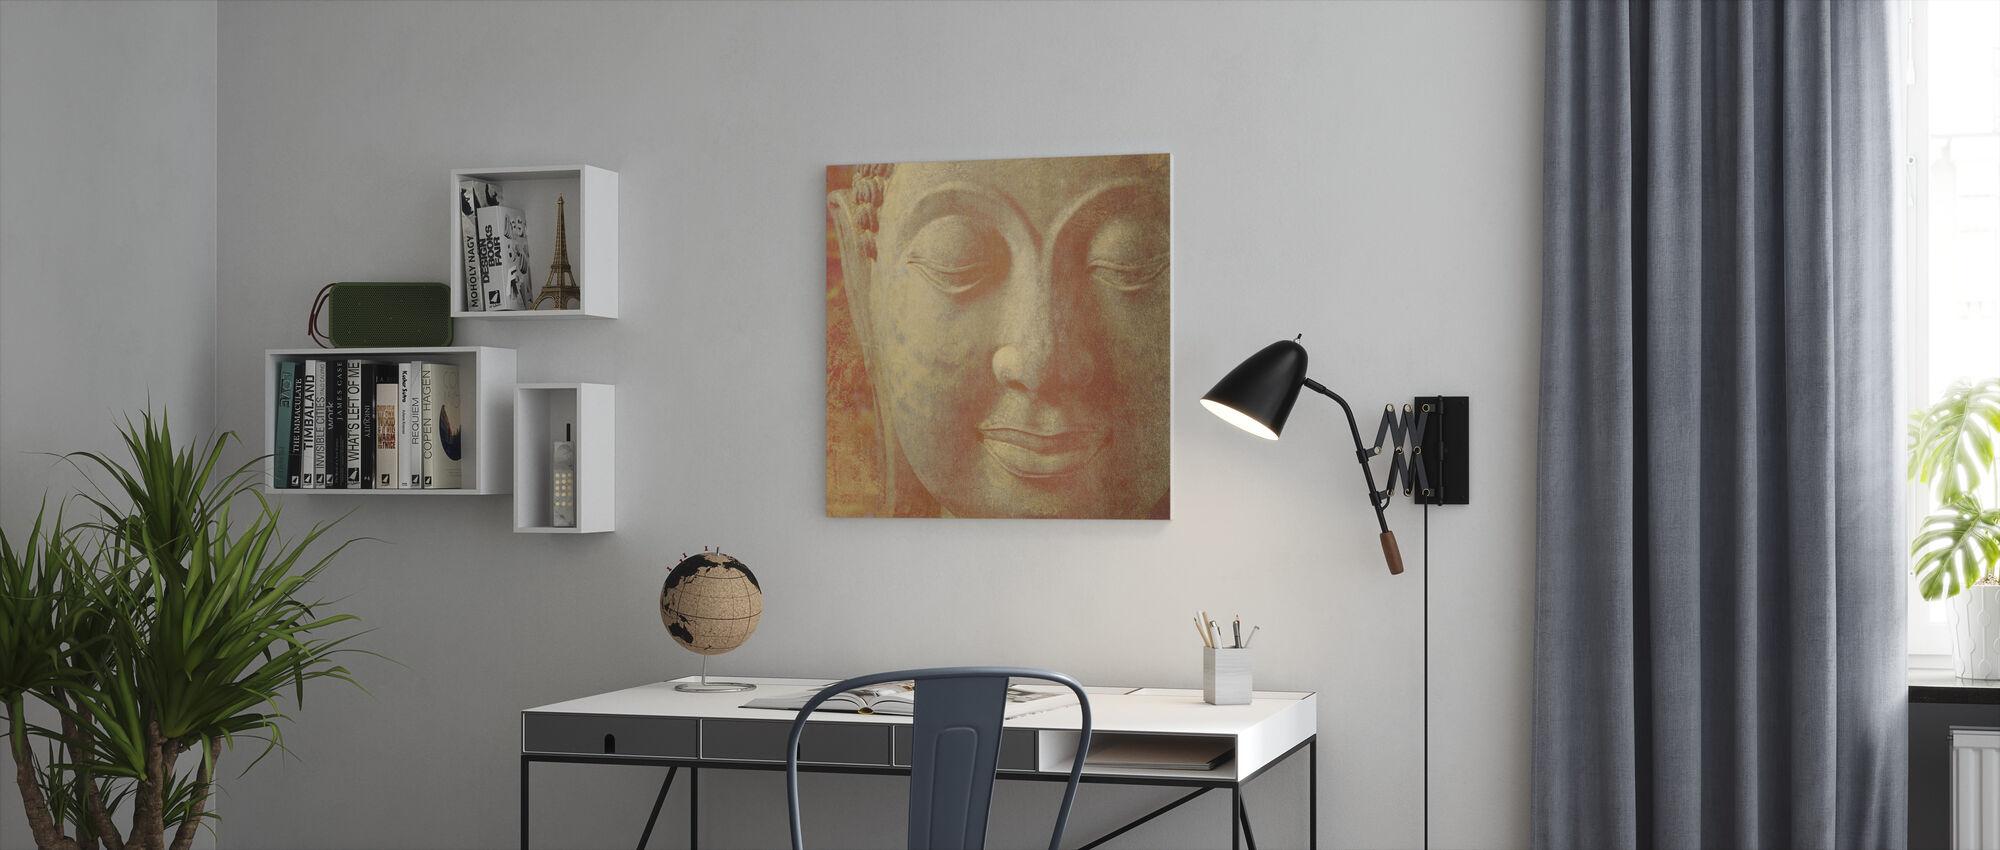 Saffron Buddha Squared - Canvas print - Office